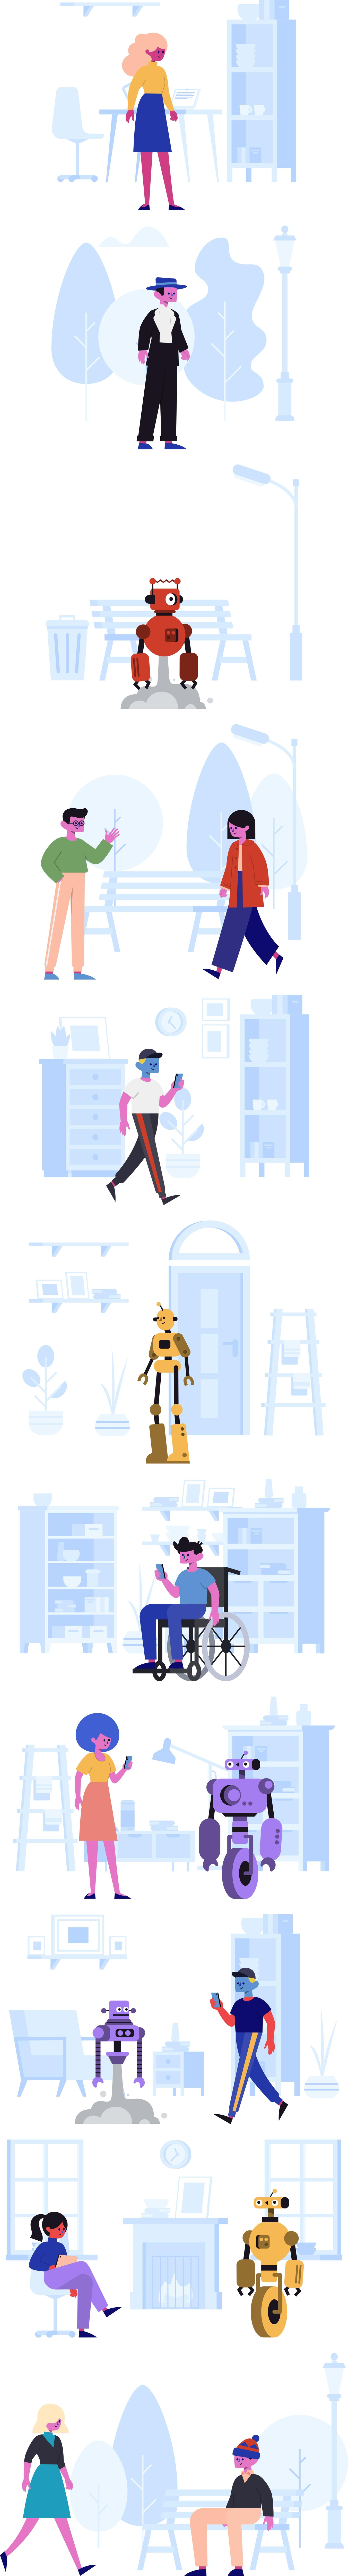 Stubborn - Free Illustrations Generator from UIGarage